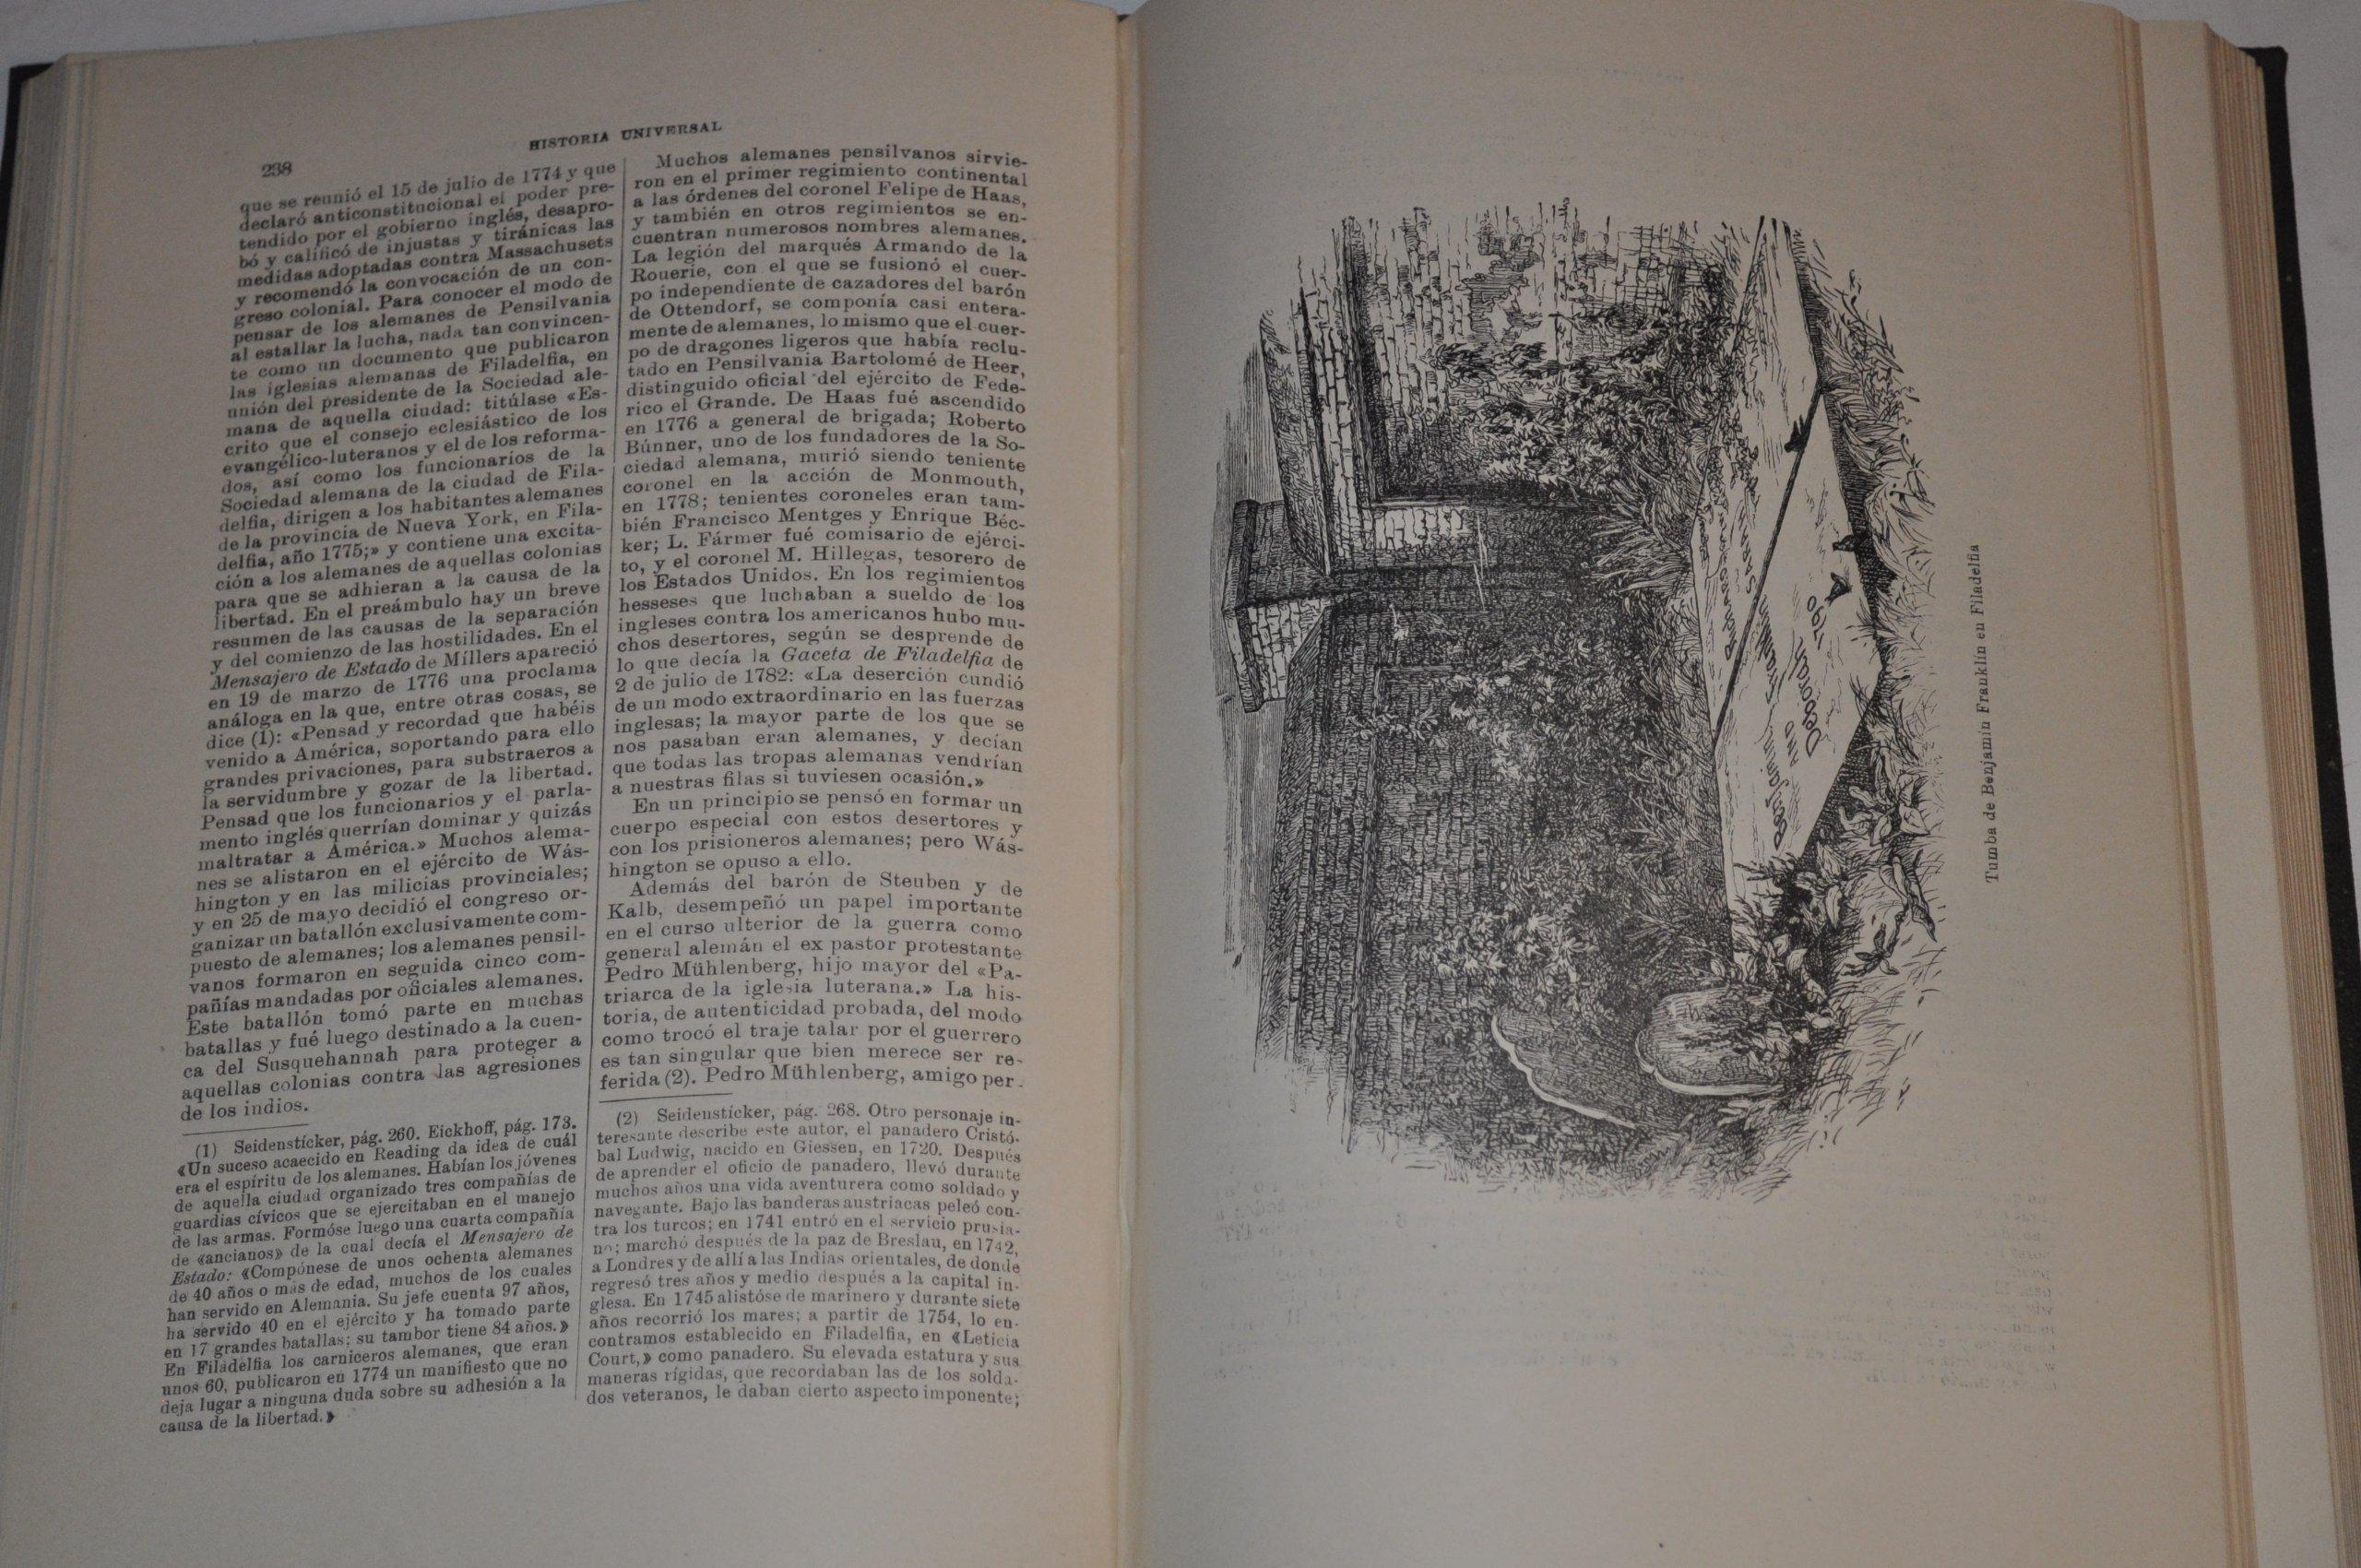 Historia Universal. Tomo XXXVII.: Amazon.es: GUILLERMO ONCKEN (DIR.): Libros